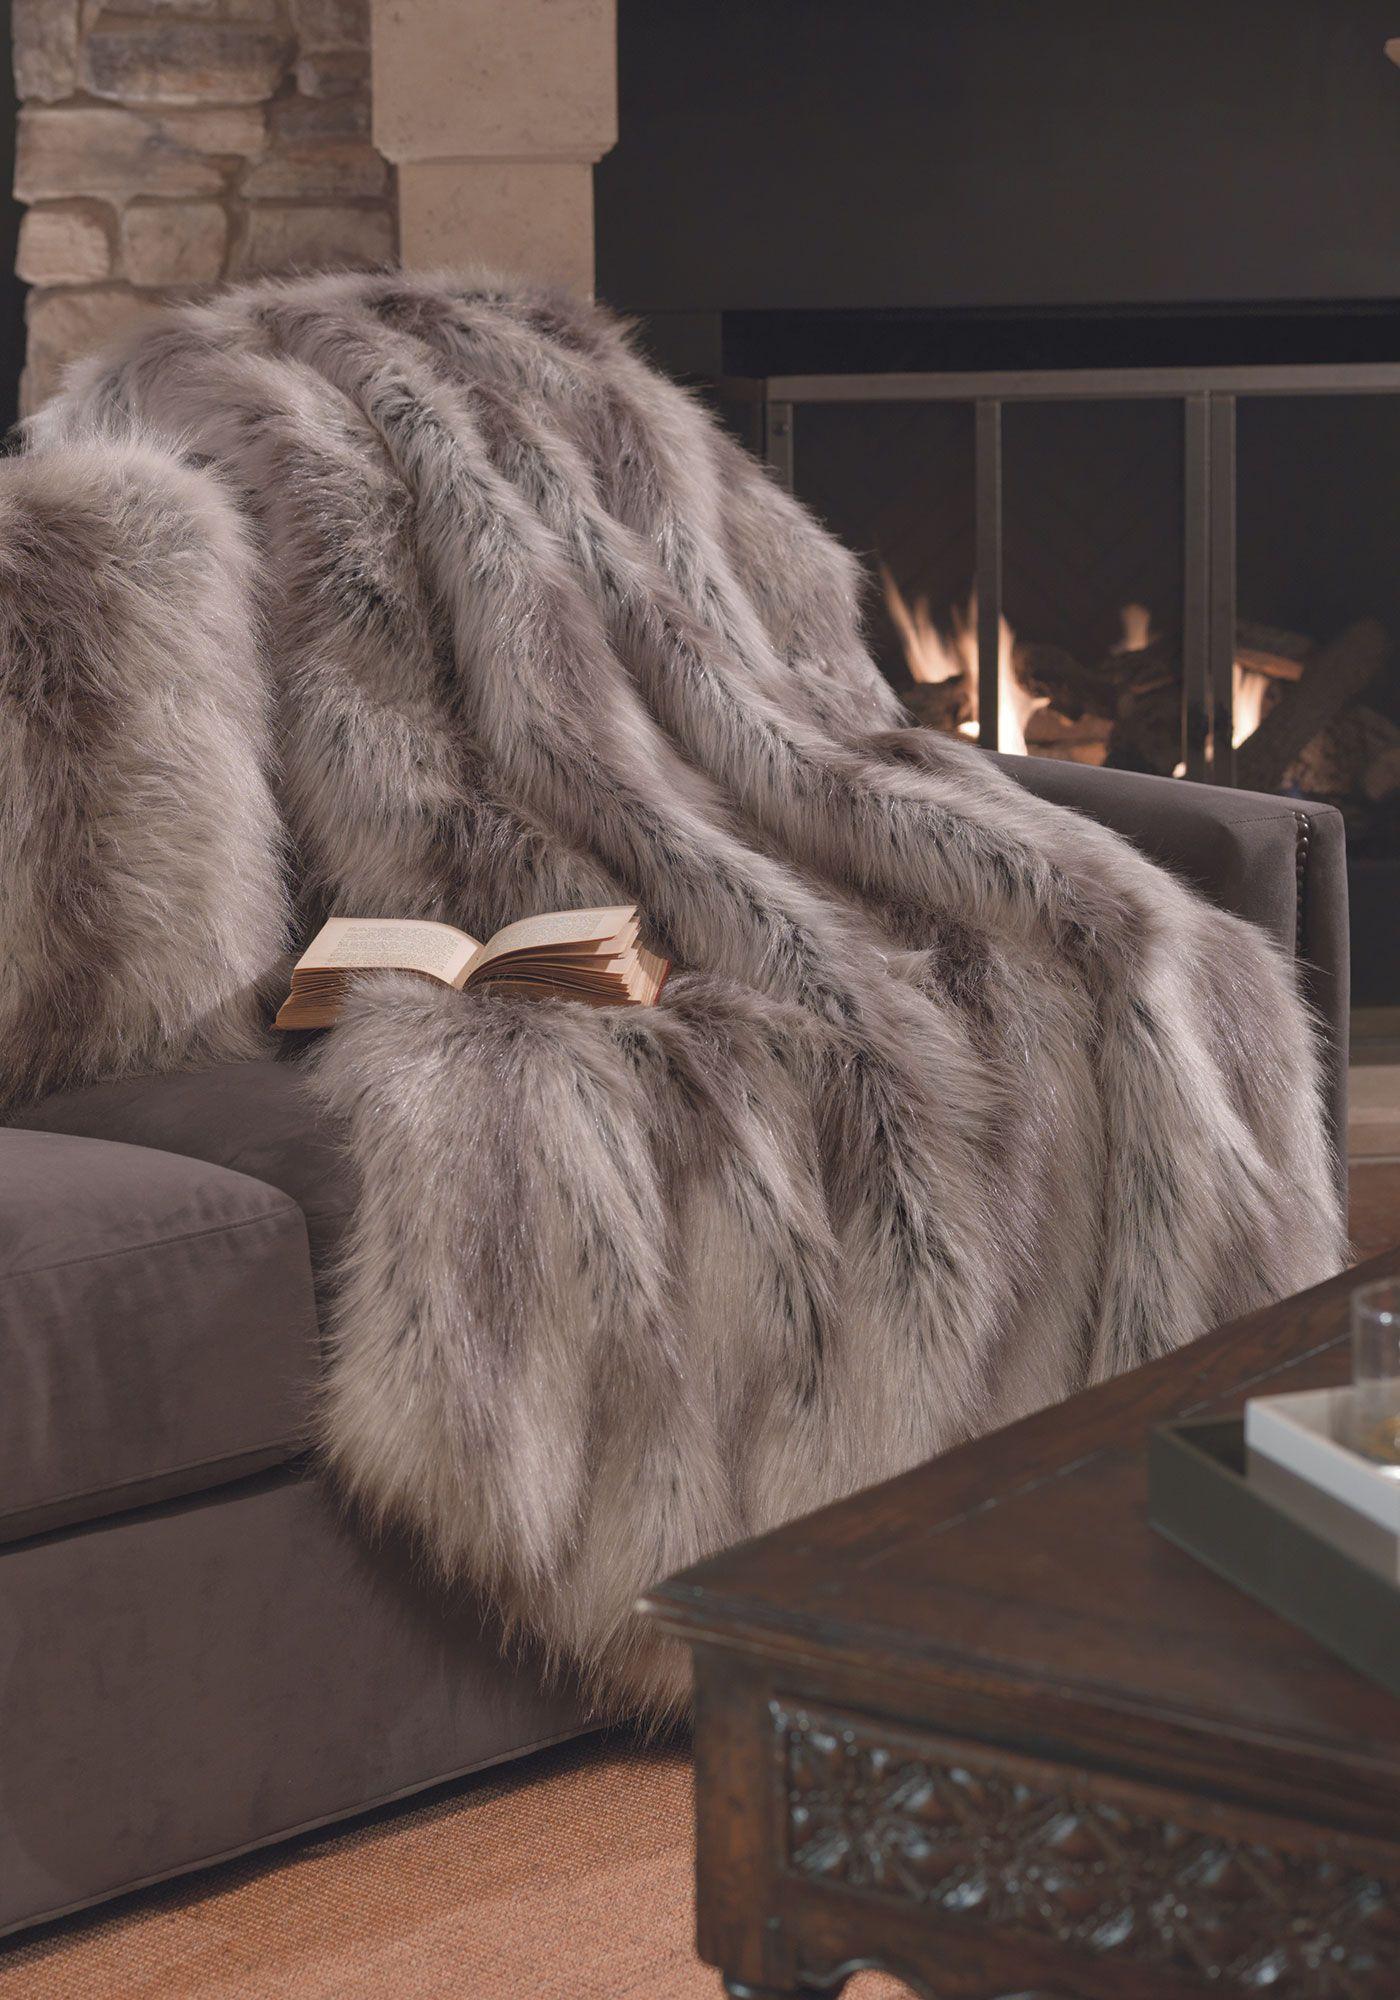 b1c20e52406 Silver Fox Limited Edition Faux Fur Throws